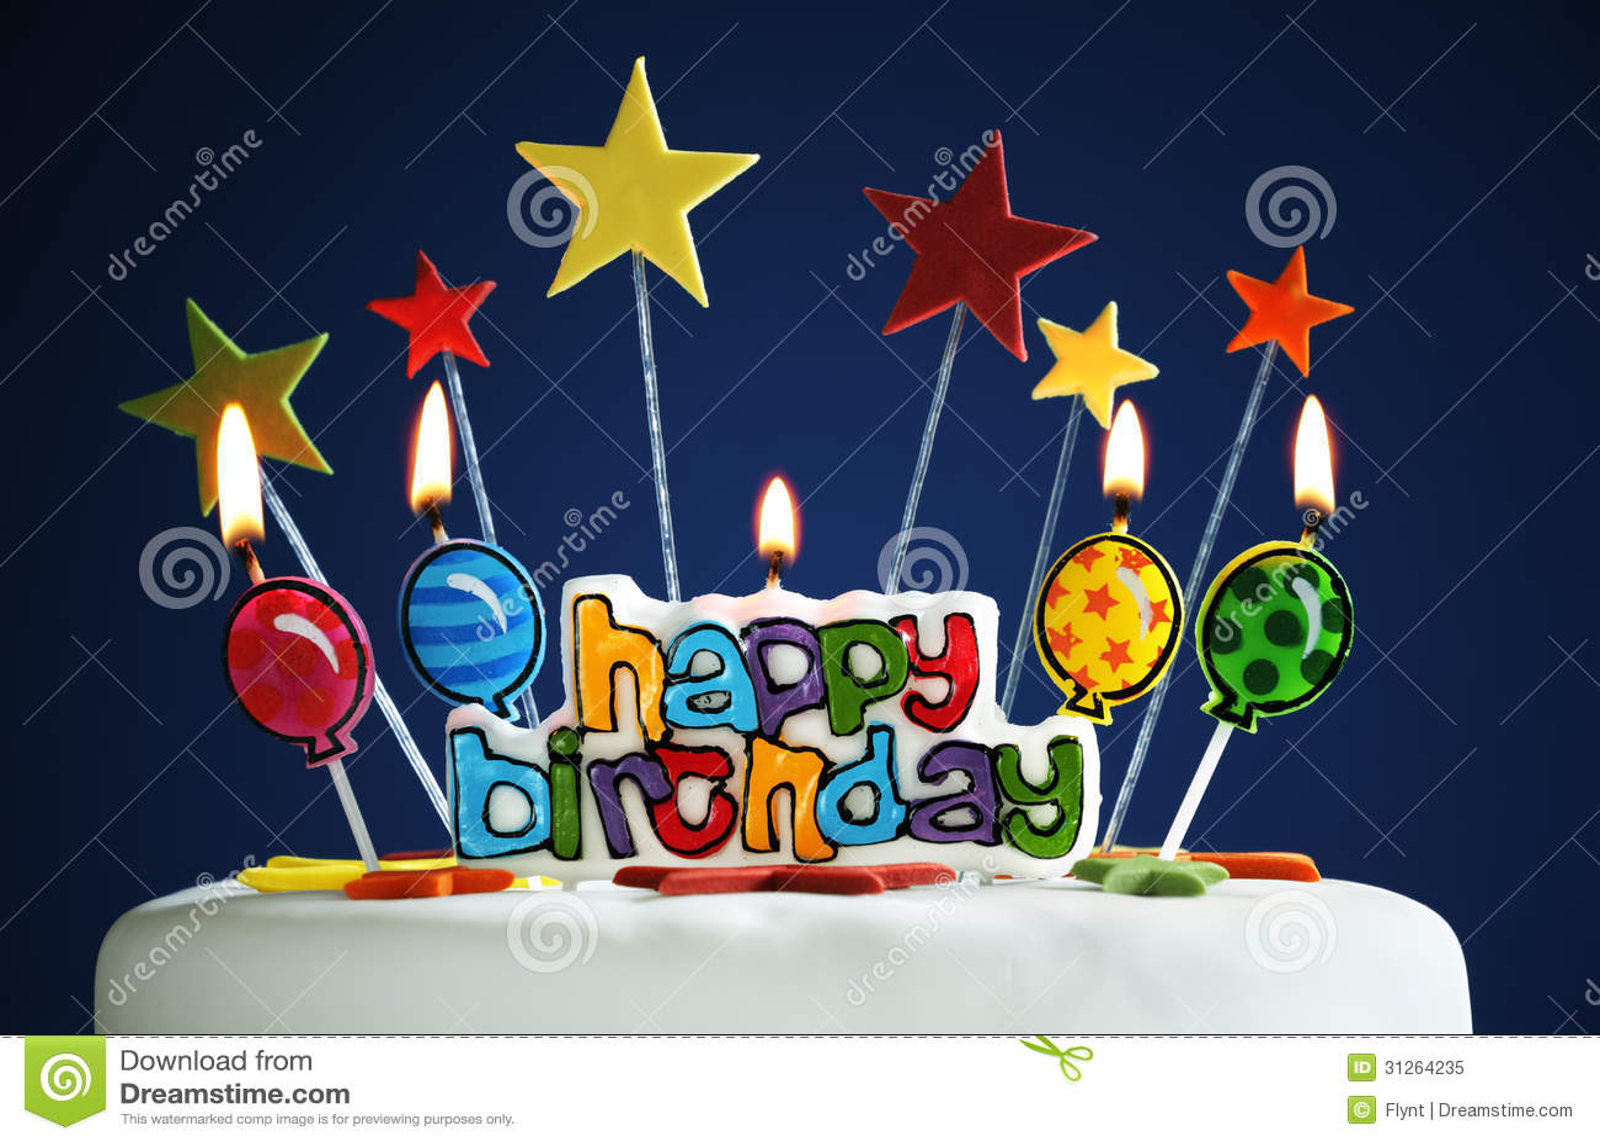 Free Happy Birthday Jpg ~ Happy birthday cake stock image image of colour wish